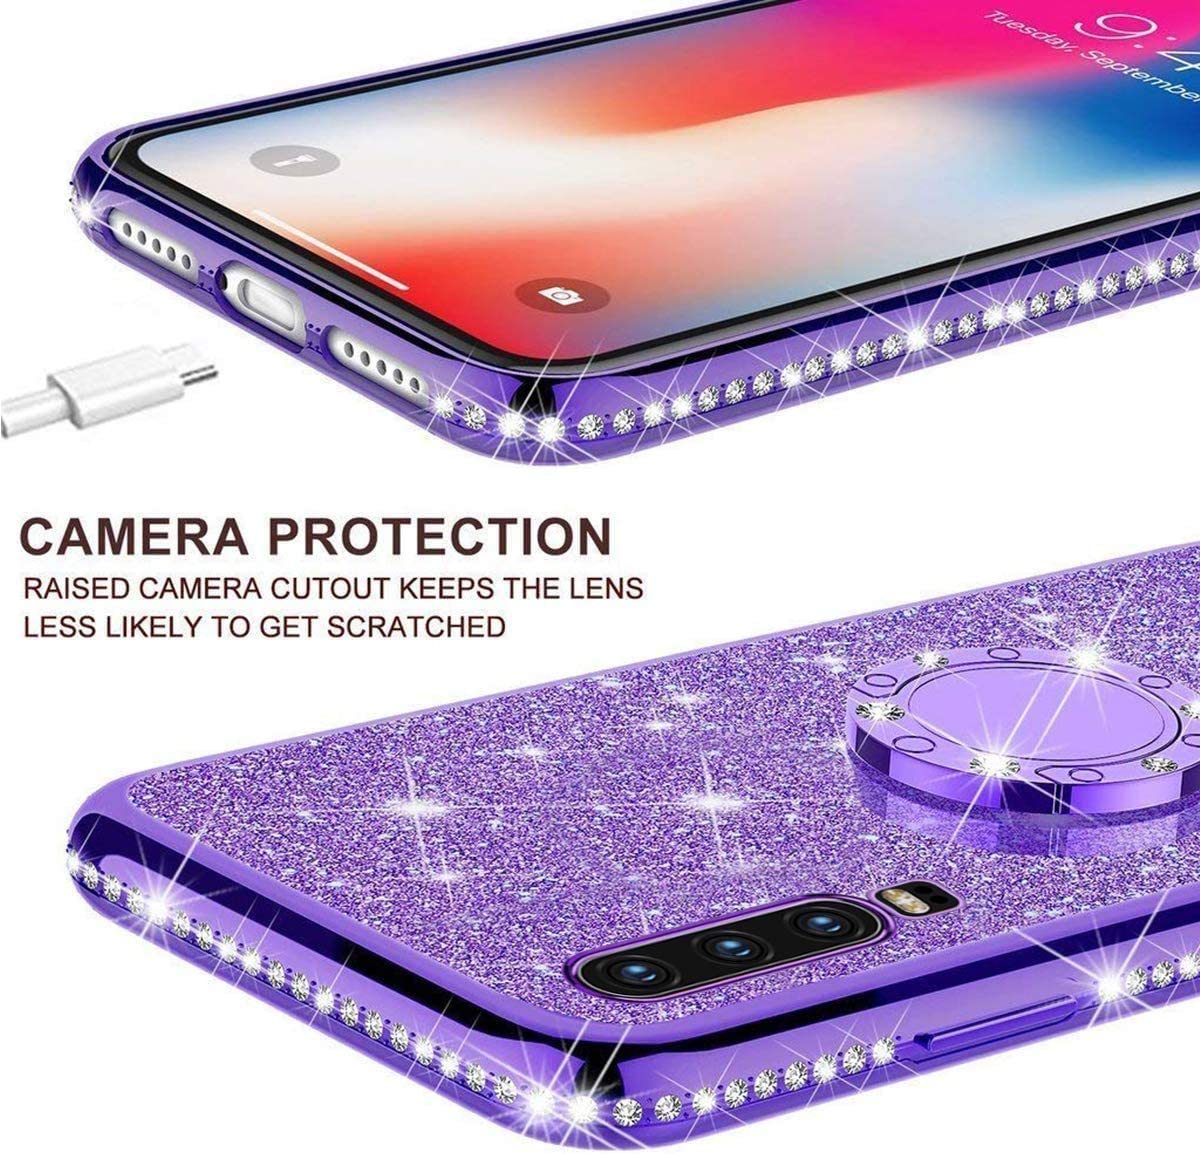 Felfy Kompatibel mit Huawei P30 Glitzer H/ülle,Kompatibel mit Huawei P30 Case Silikon Bling Sparkle Gl/änzend Pailletten TPU Bumper Schutzh/ülle Ultra Schlank Handytasche Handyh/ülle,Gold